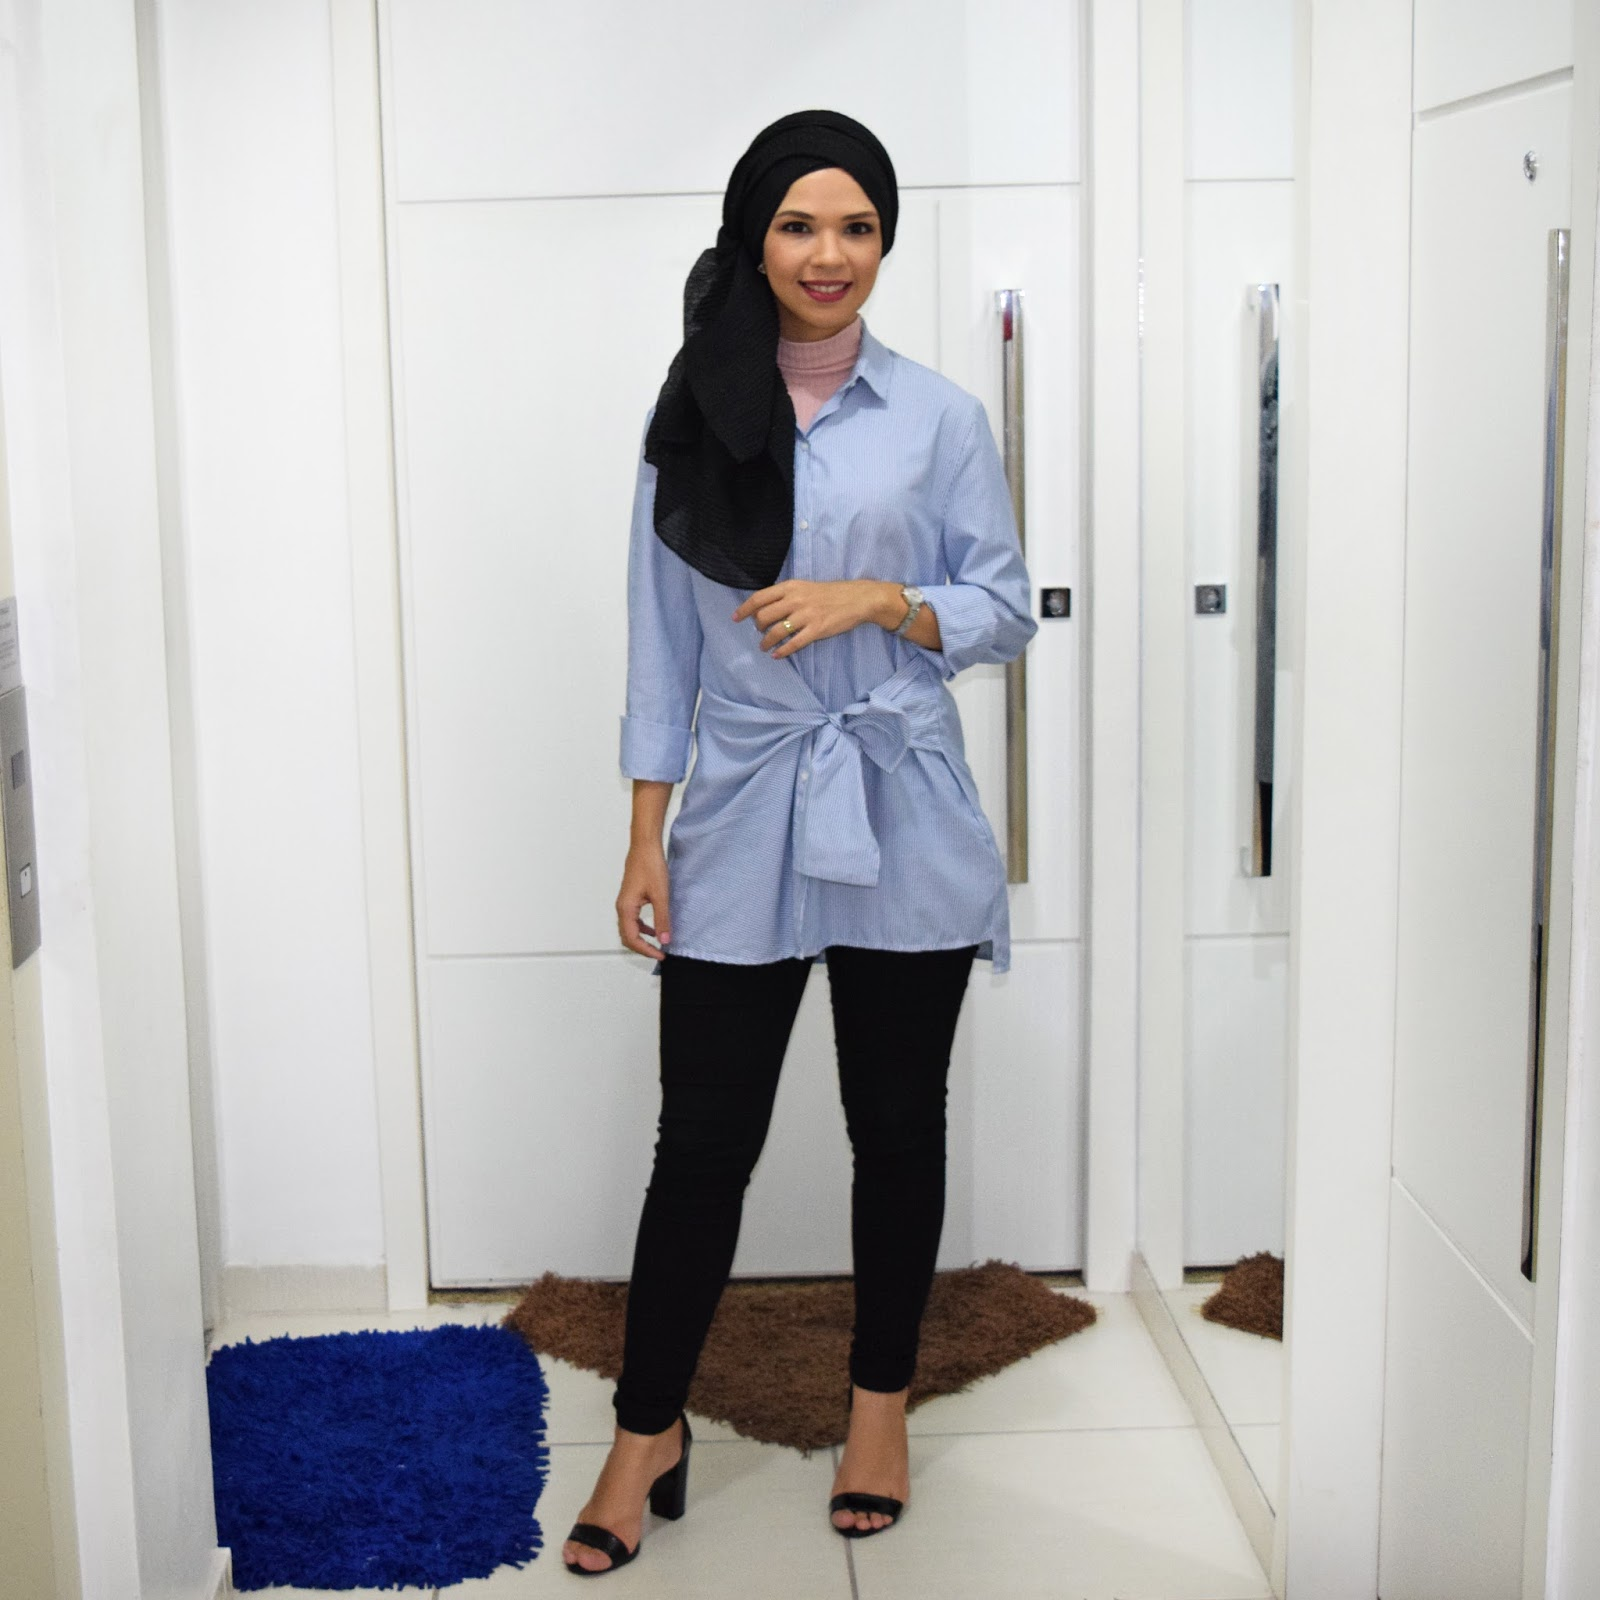 hijab, turbante, moda muçulmana, moda recatada, moda cristã, moda evangélica, zara, look do dia, ootd